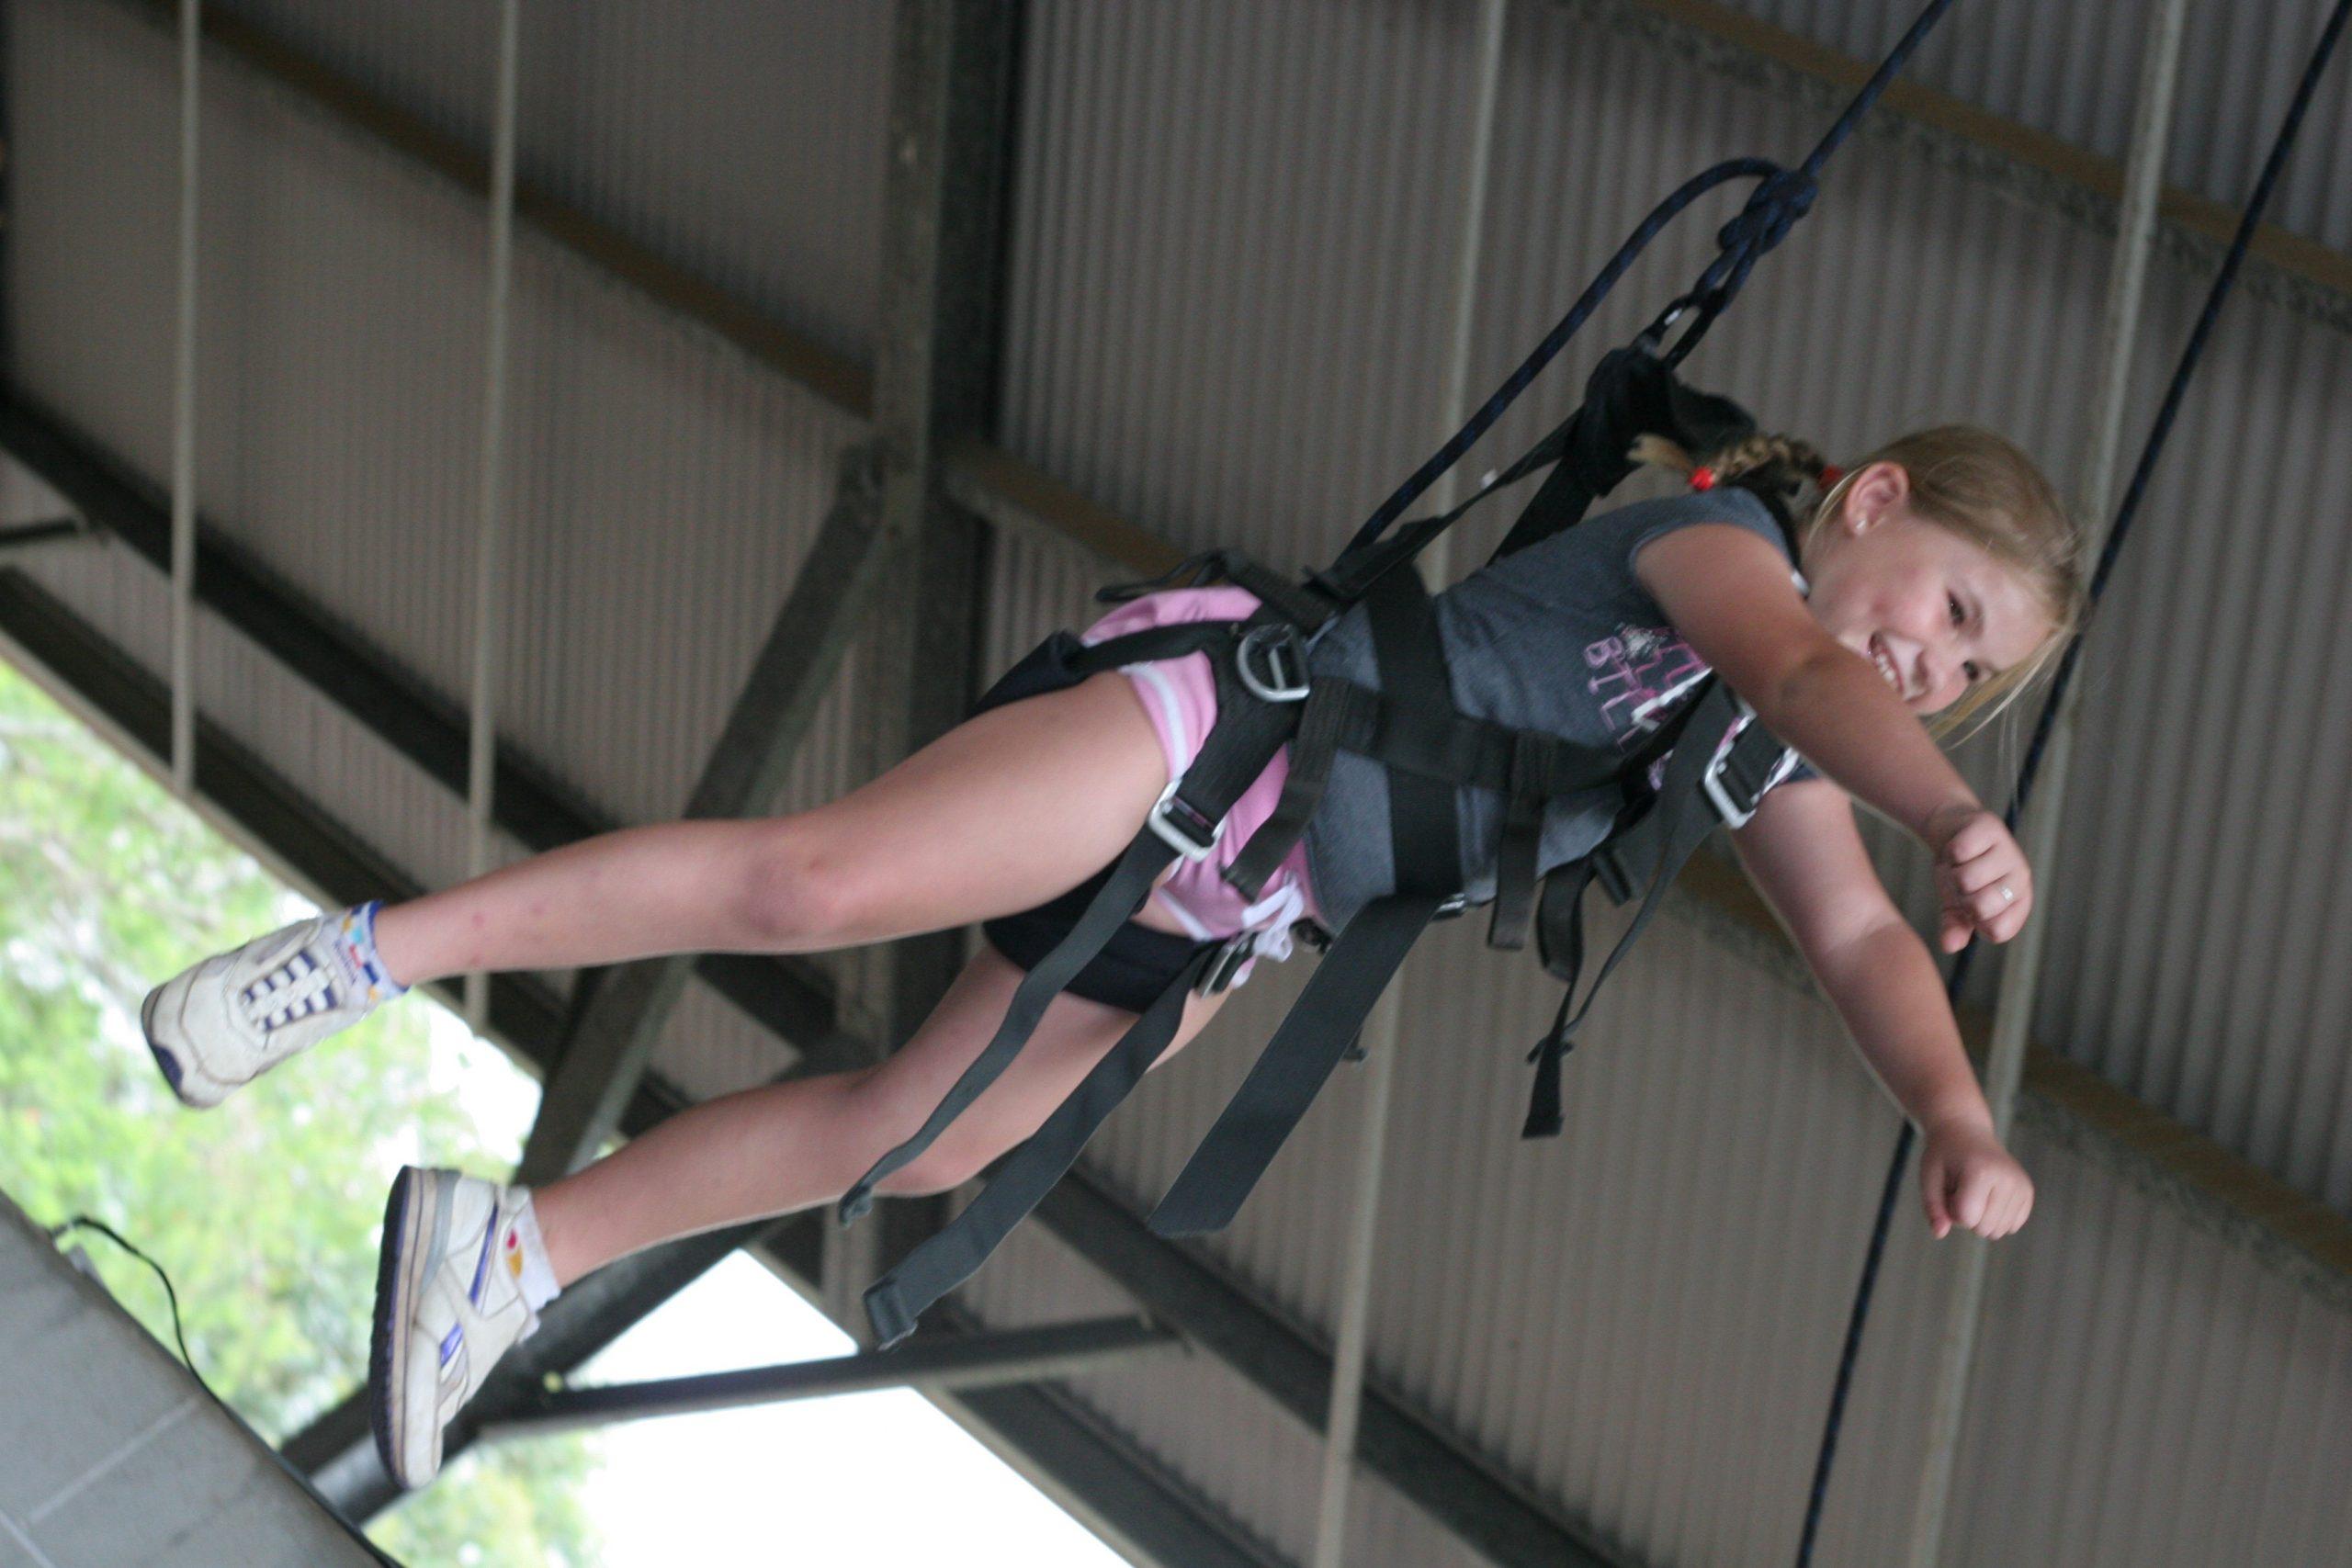 Stunt 1